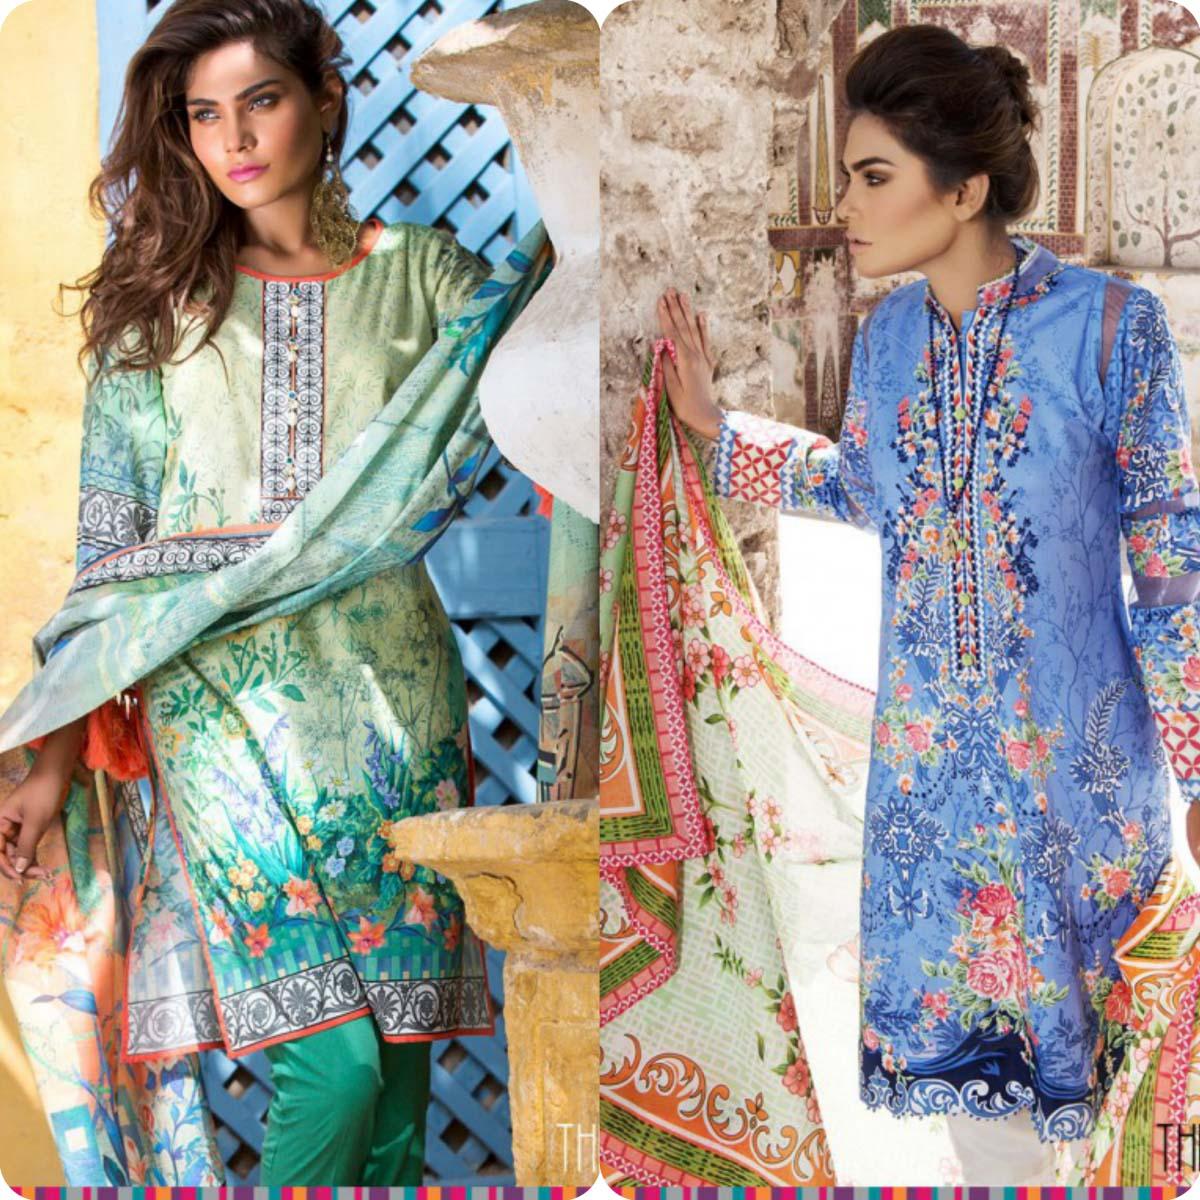 Stylish Embroidered Eid KurtisTunics for Girls By THREDZ 2016-2016 Complete Look-Book (12)